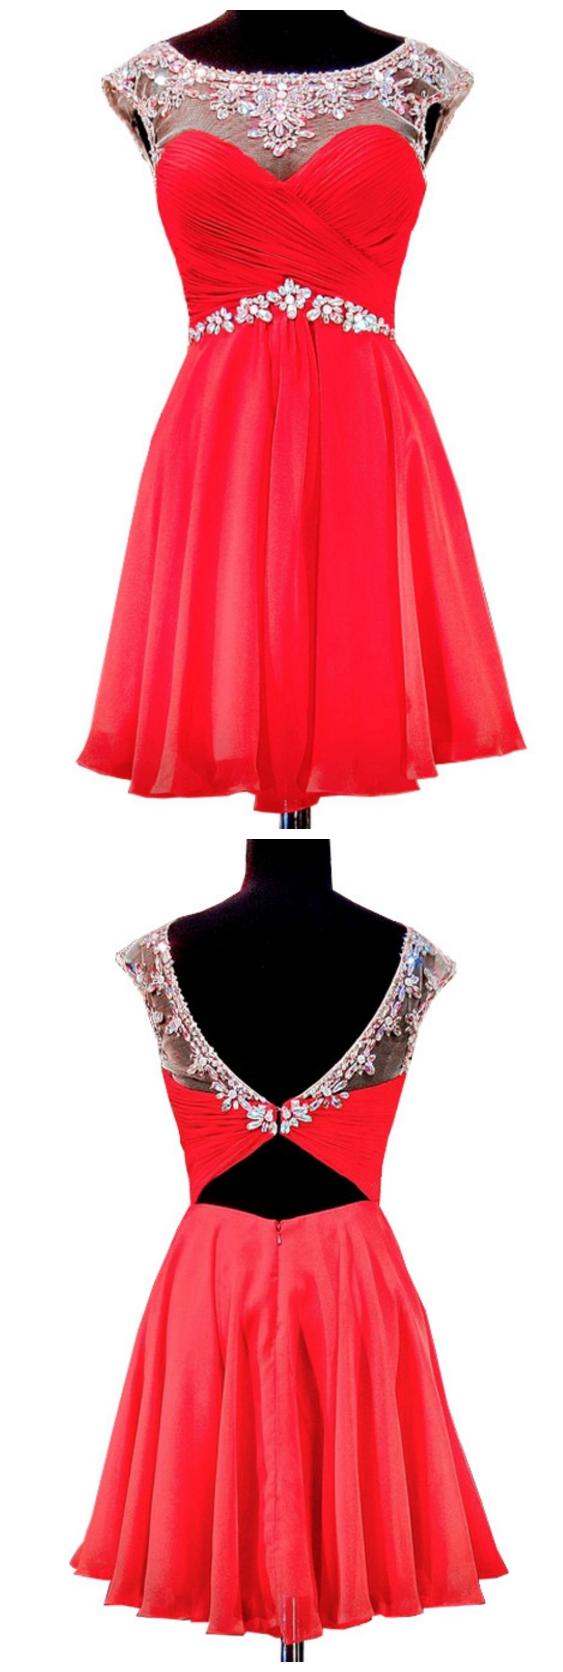 Cute th grade prom dresses sweetheart spaghetti strap top